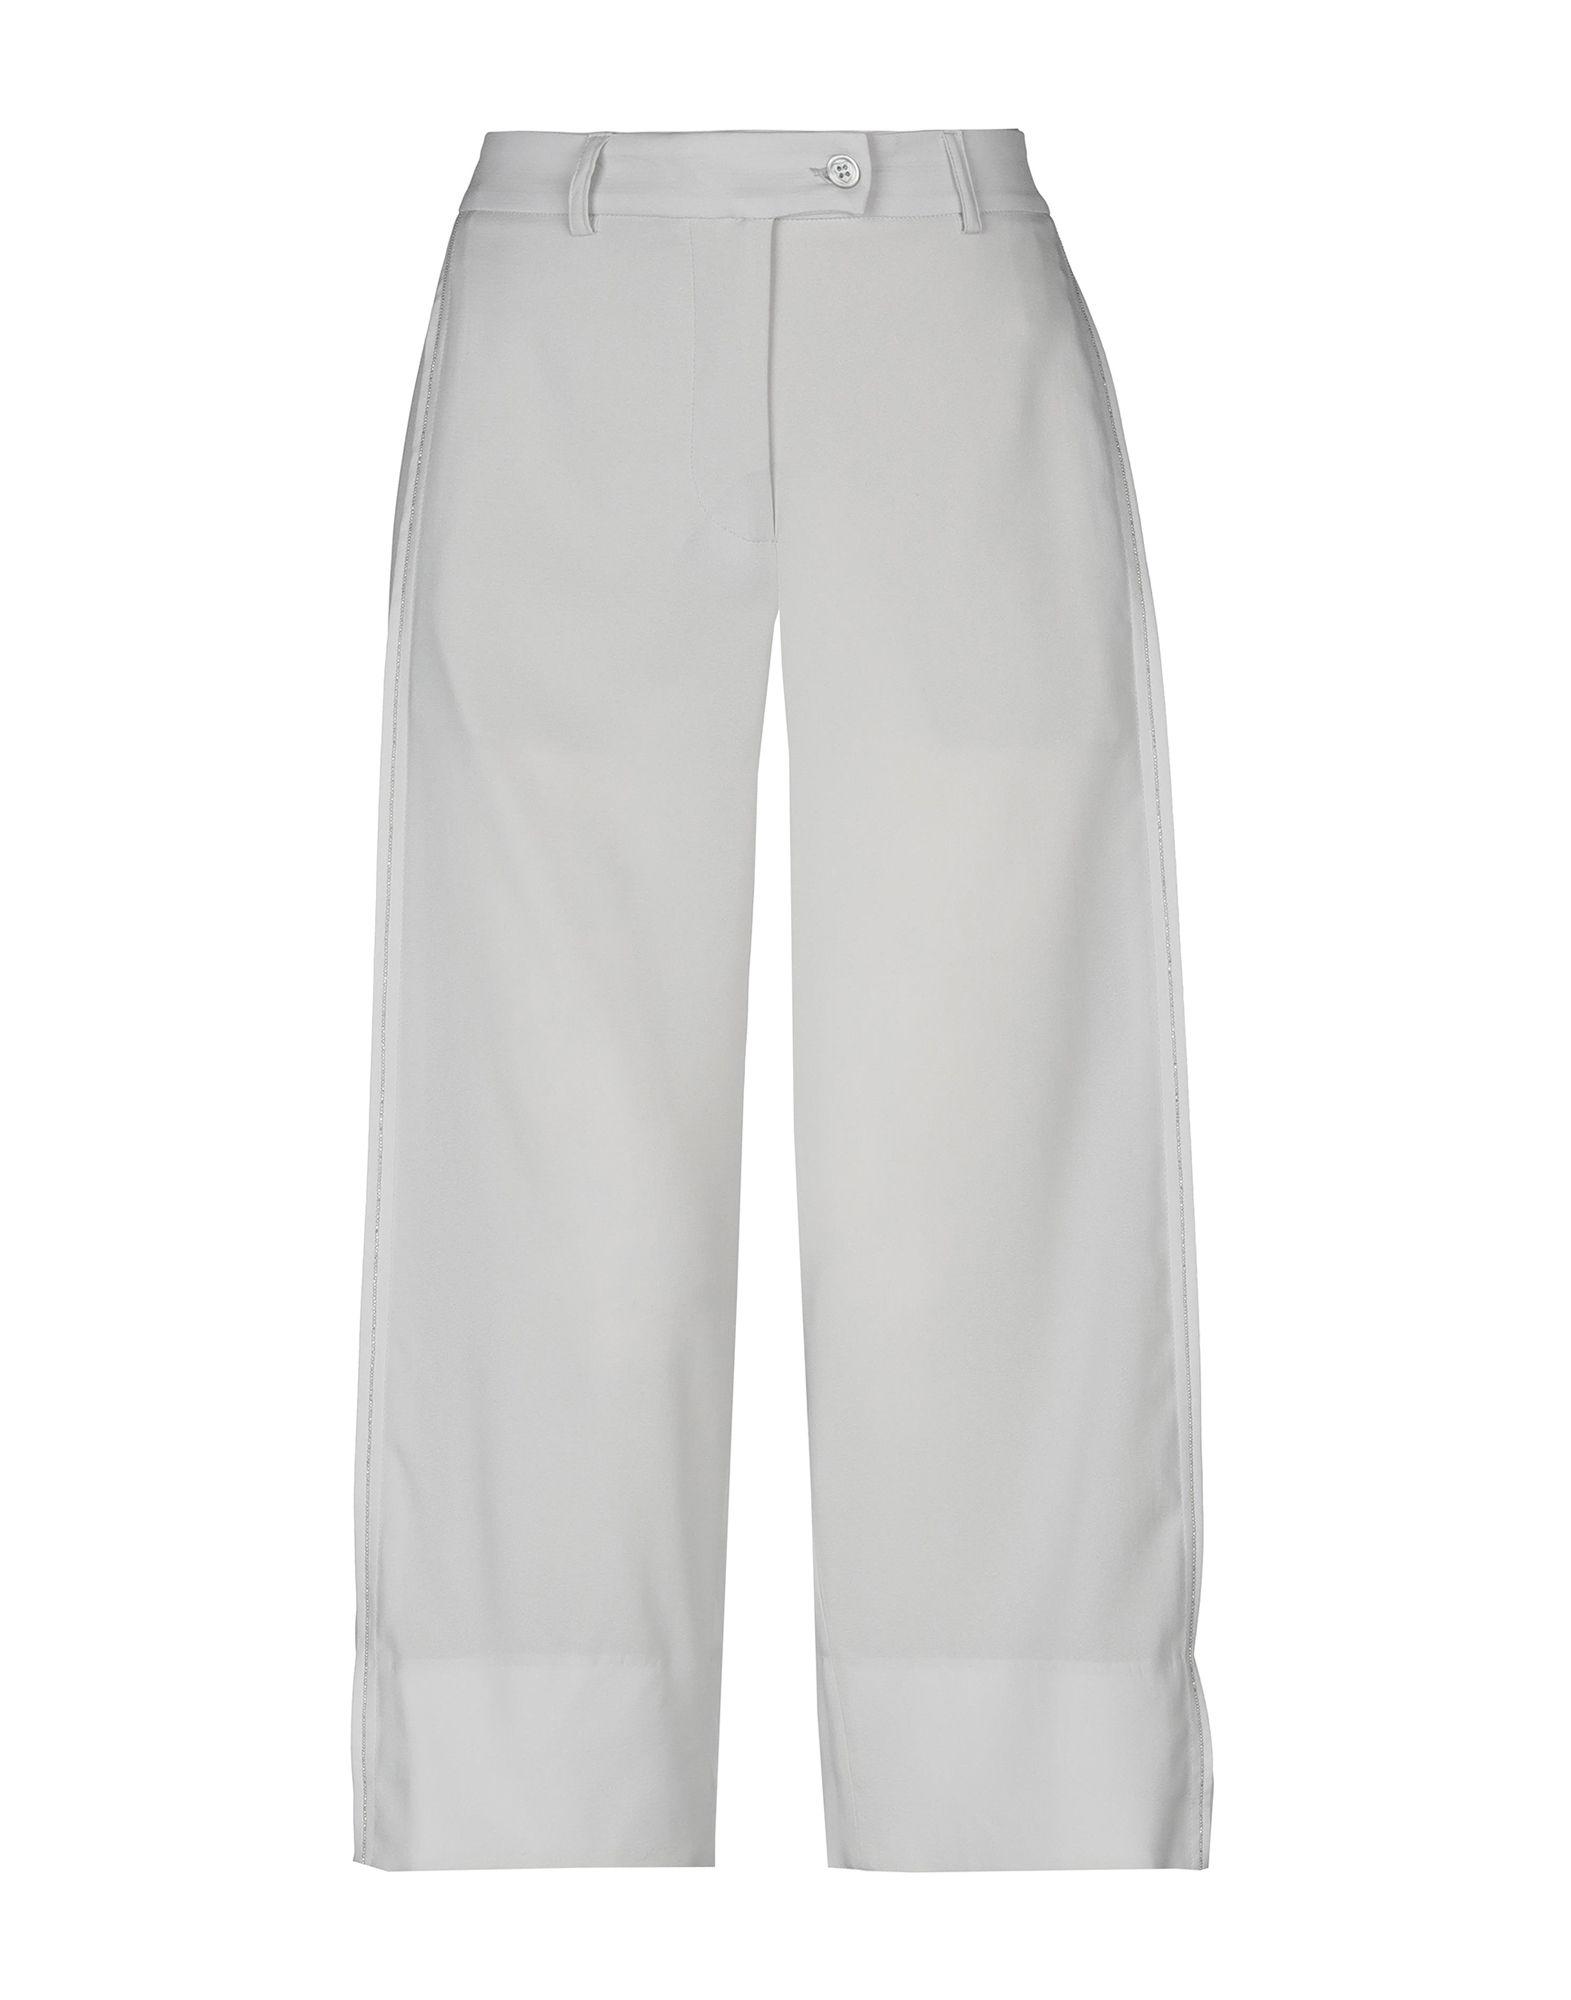 CRUCIANI Брюки-капри брюки капри из хлопка и модала